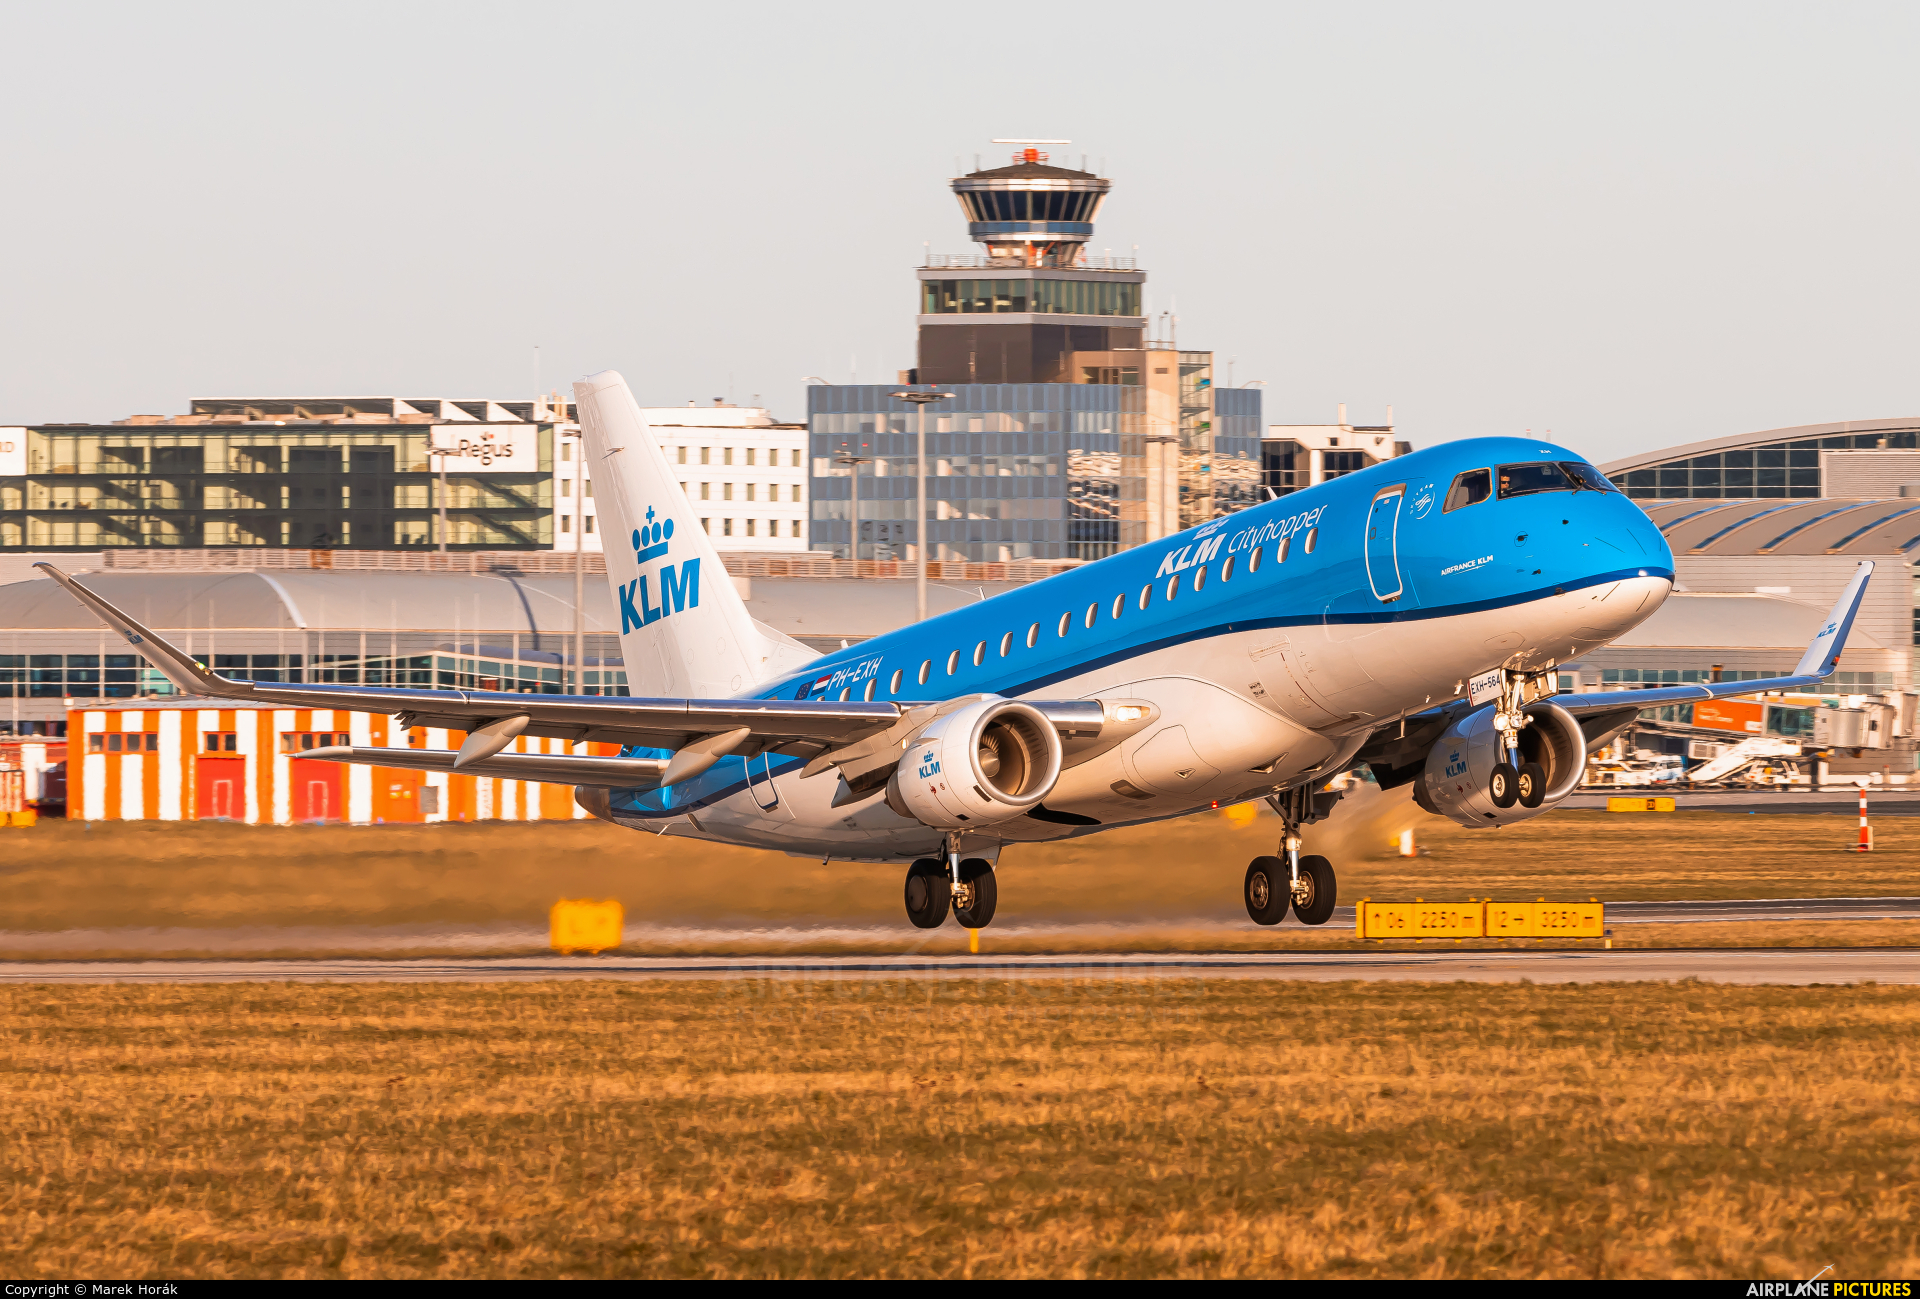 KLM Cityhopper PH-EXW aircraft at Prague - Václav Havel